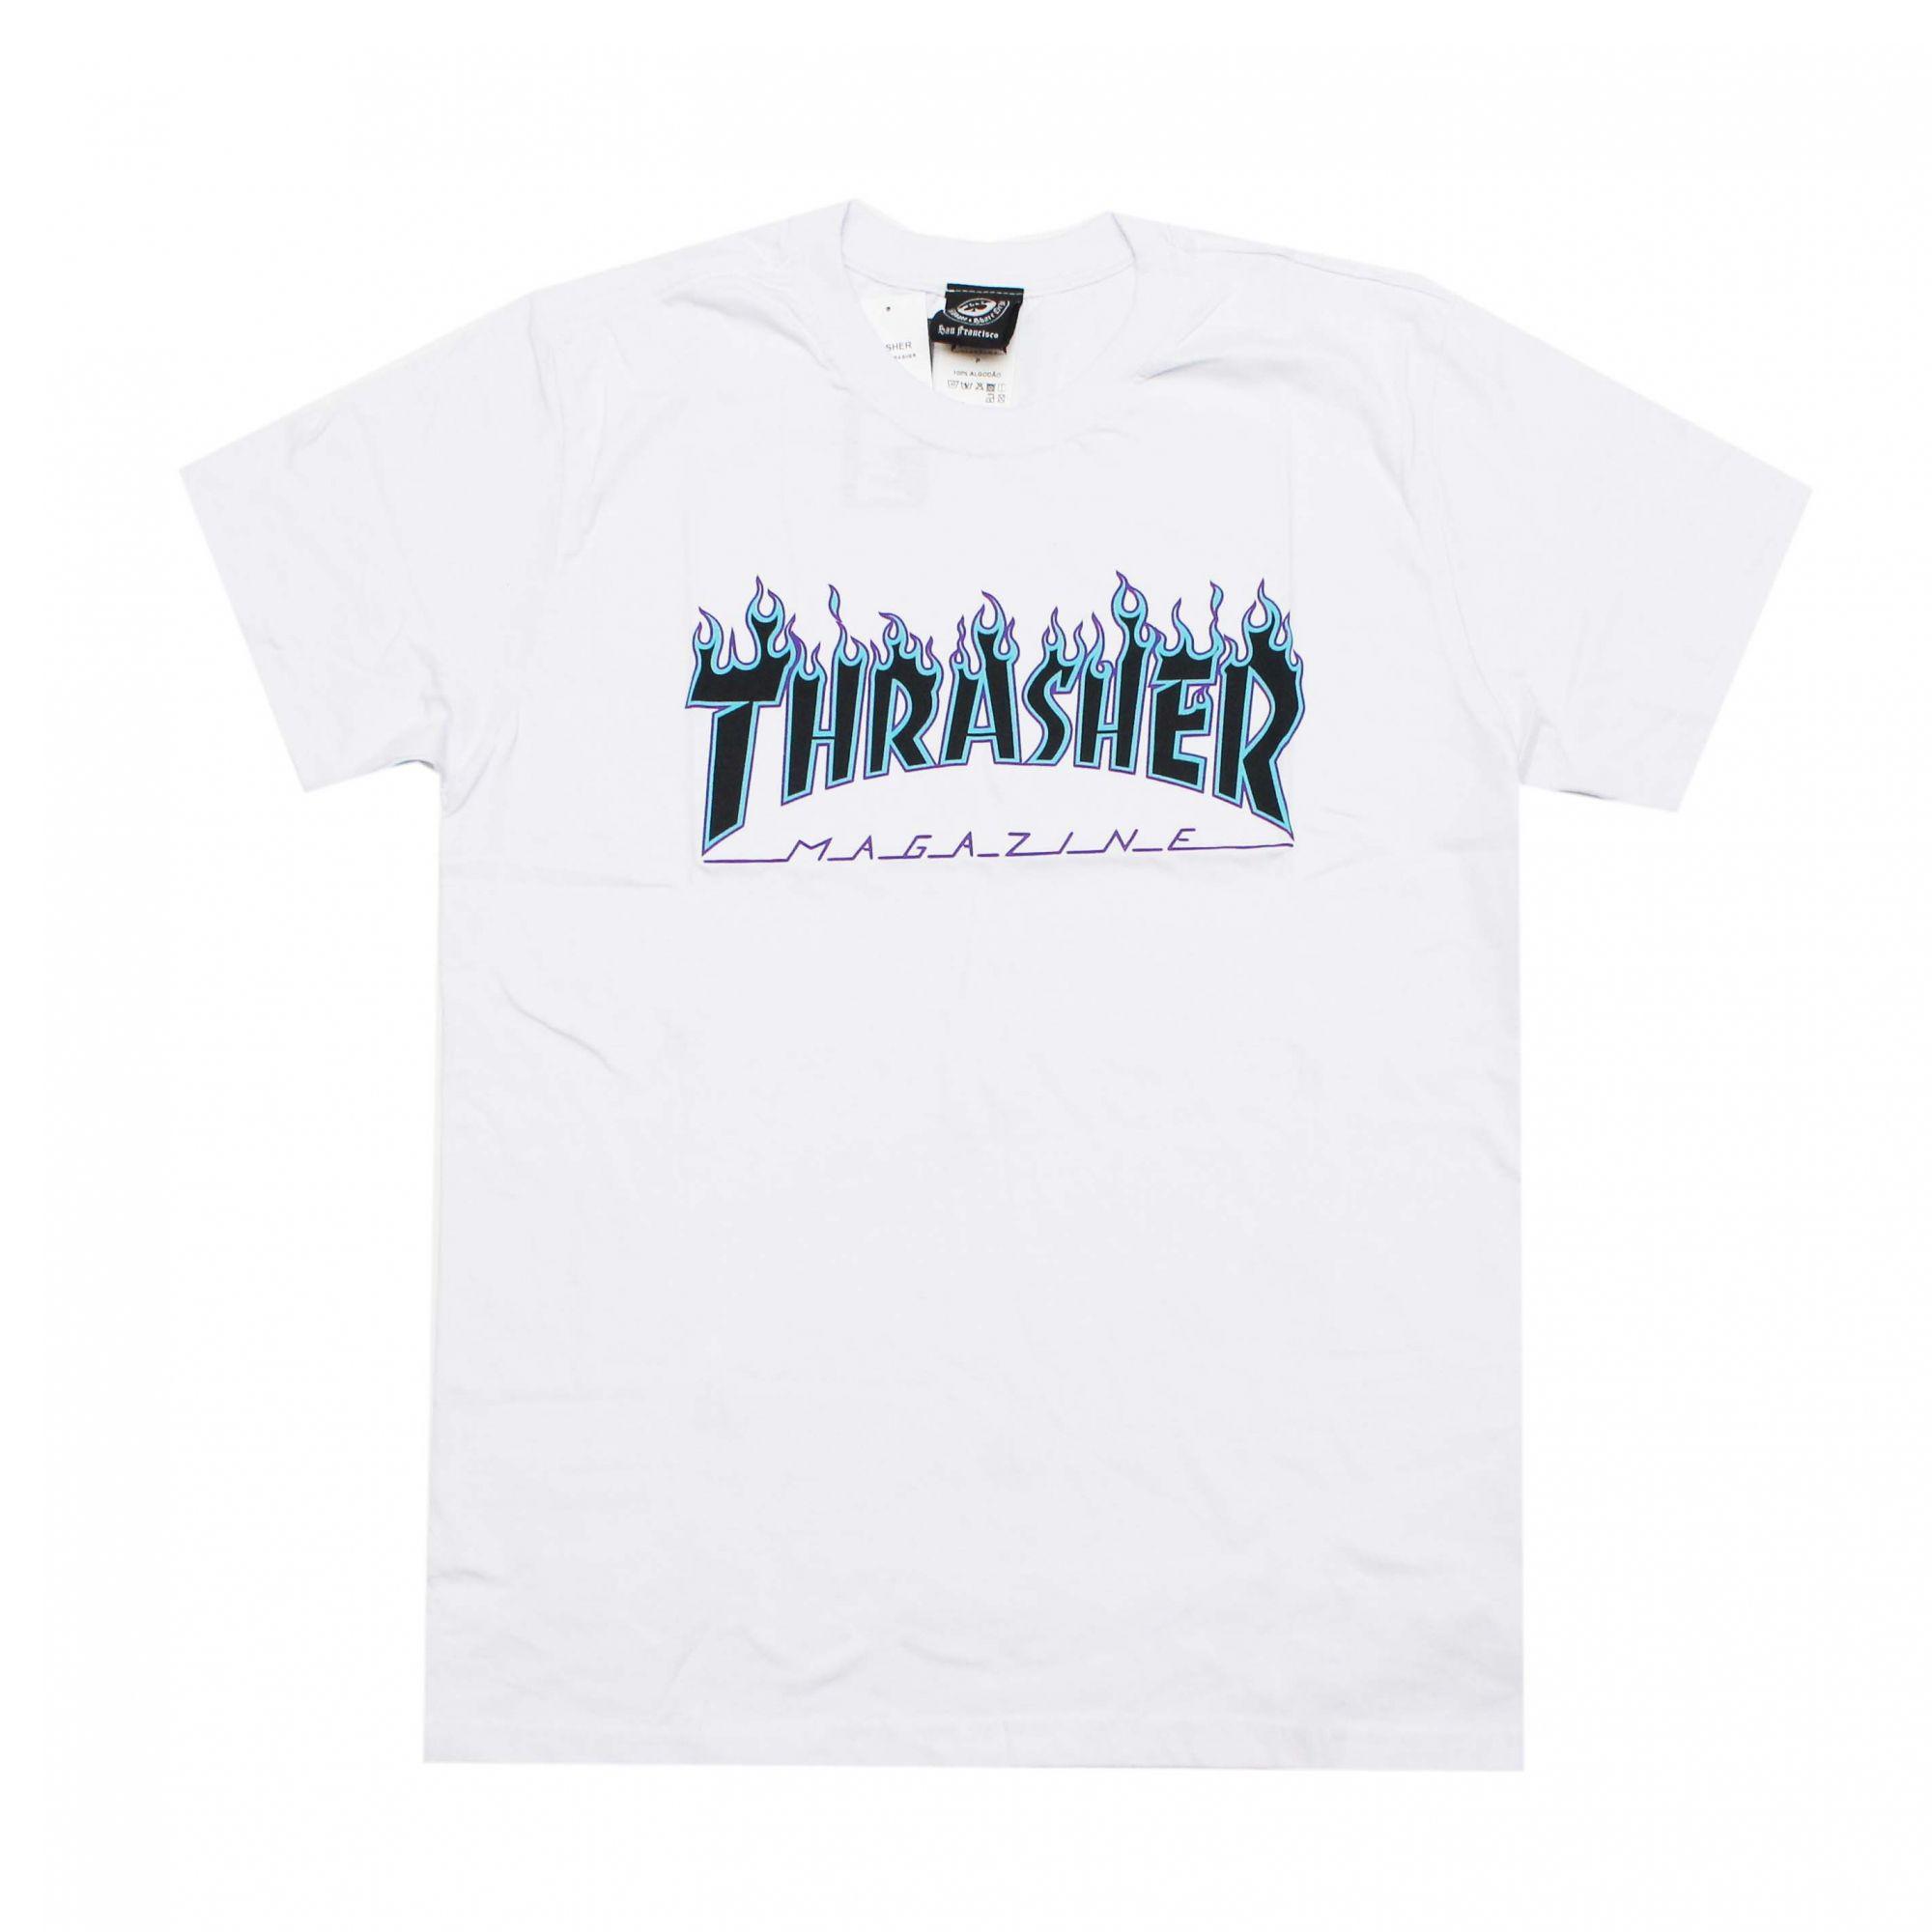 Camiseta Thrasher Magazine Purple Flame Branco